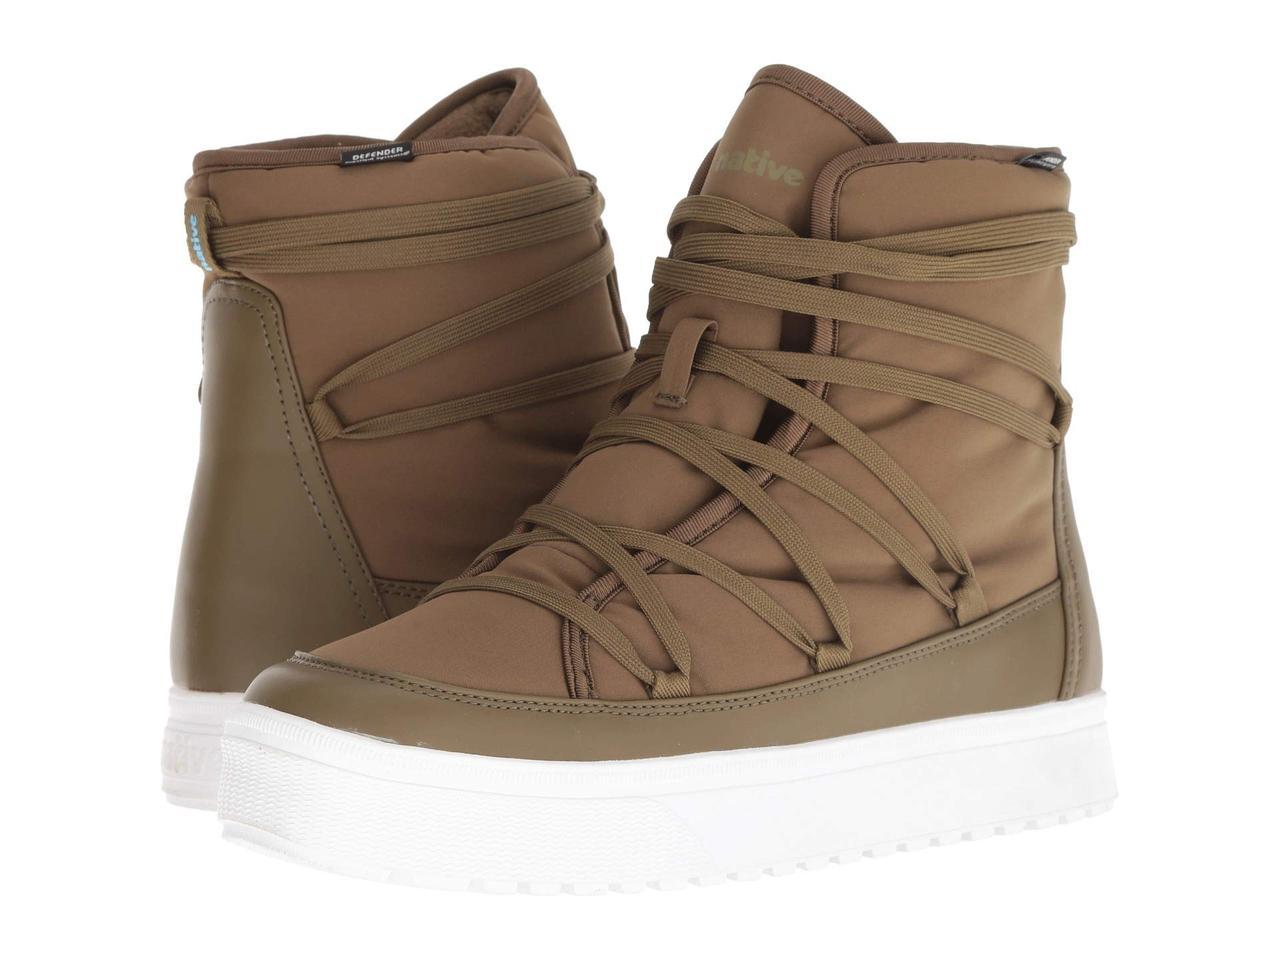 b14e3d320d21 Кроссовки/Кеды (Оригинал) Native Shoes Chamonix Utilli Green/Shell White